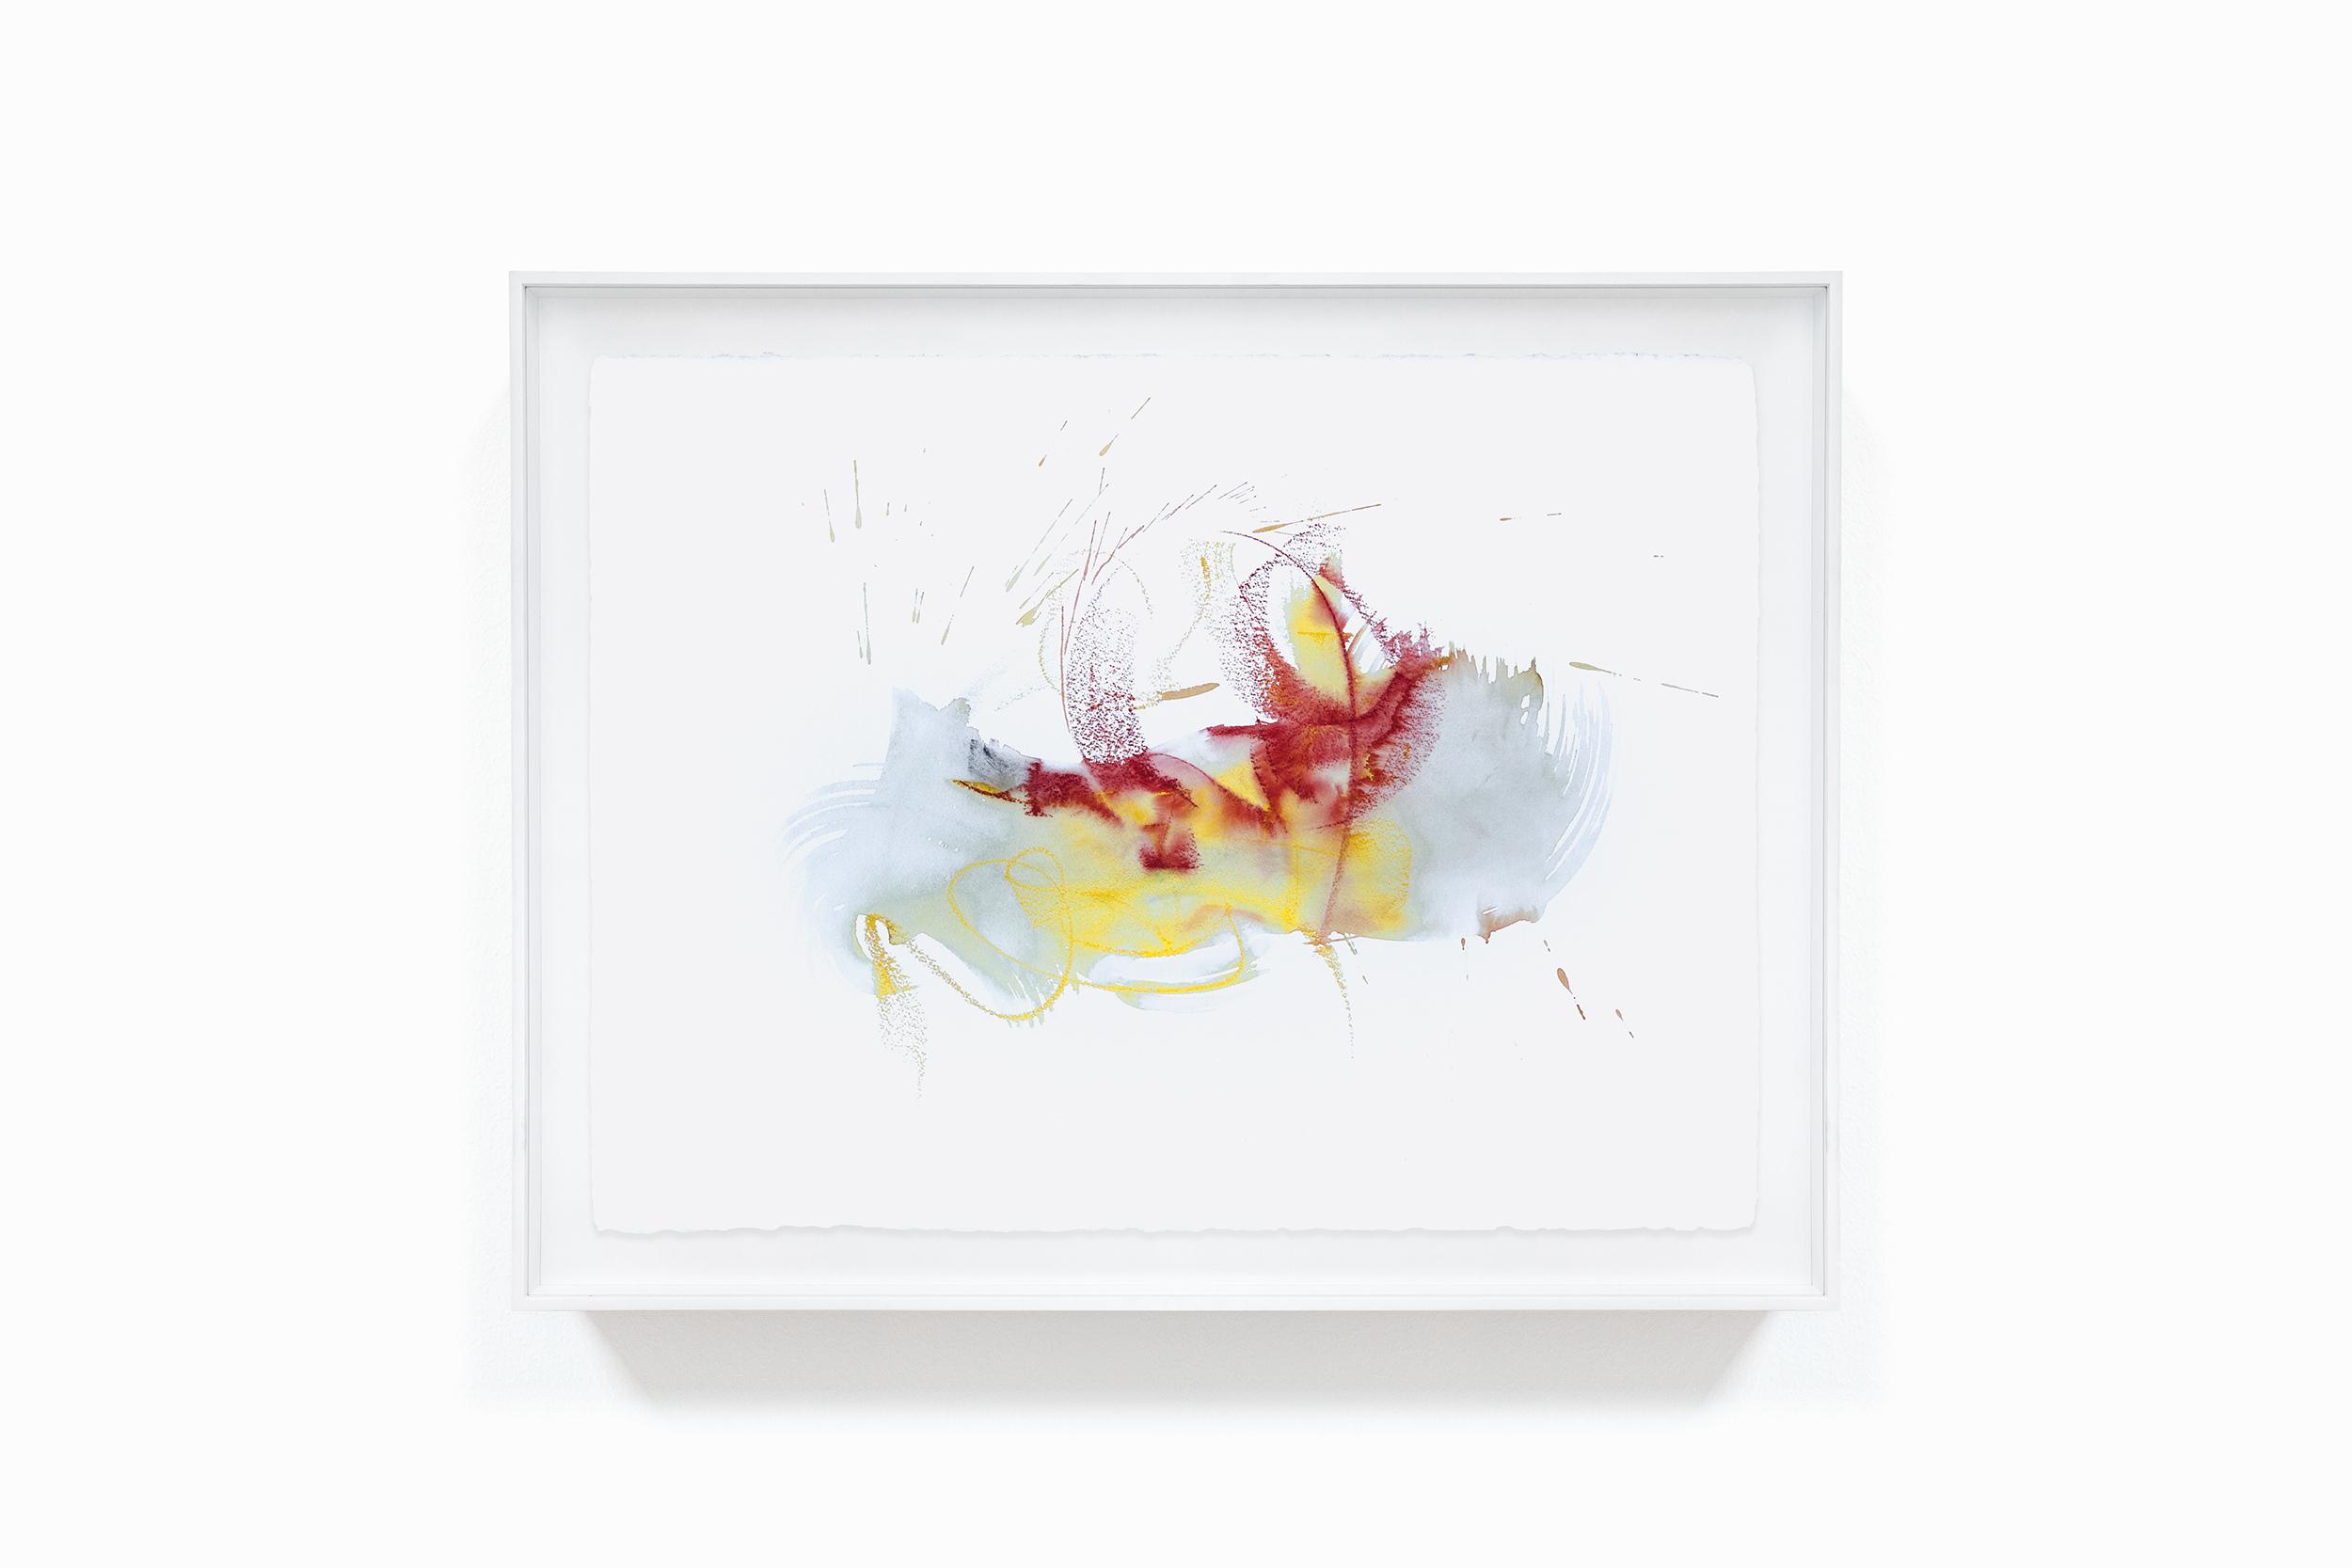 085 Andre Gigante Pintura Painting bonjourmolotov La.jpg